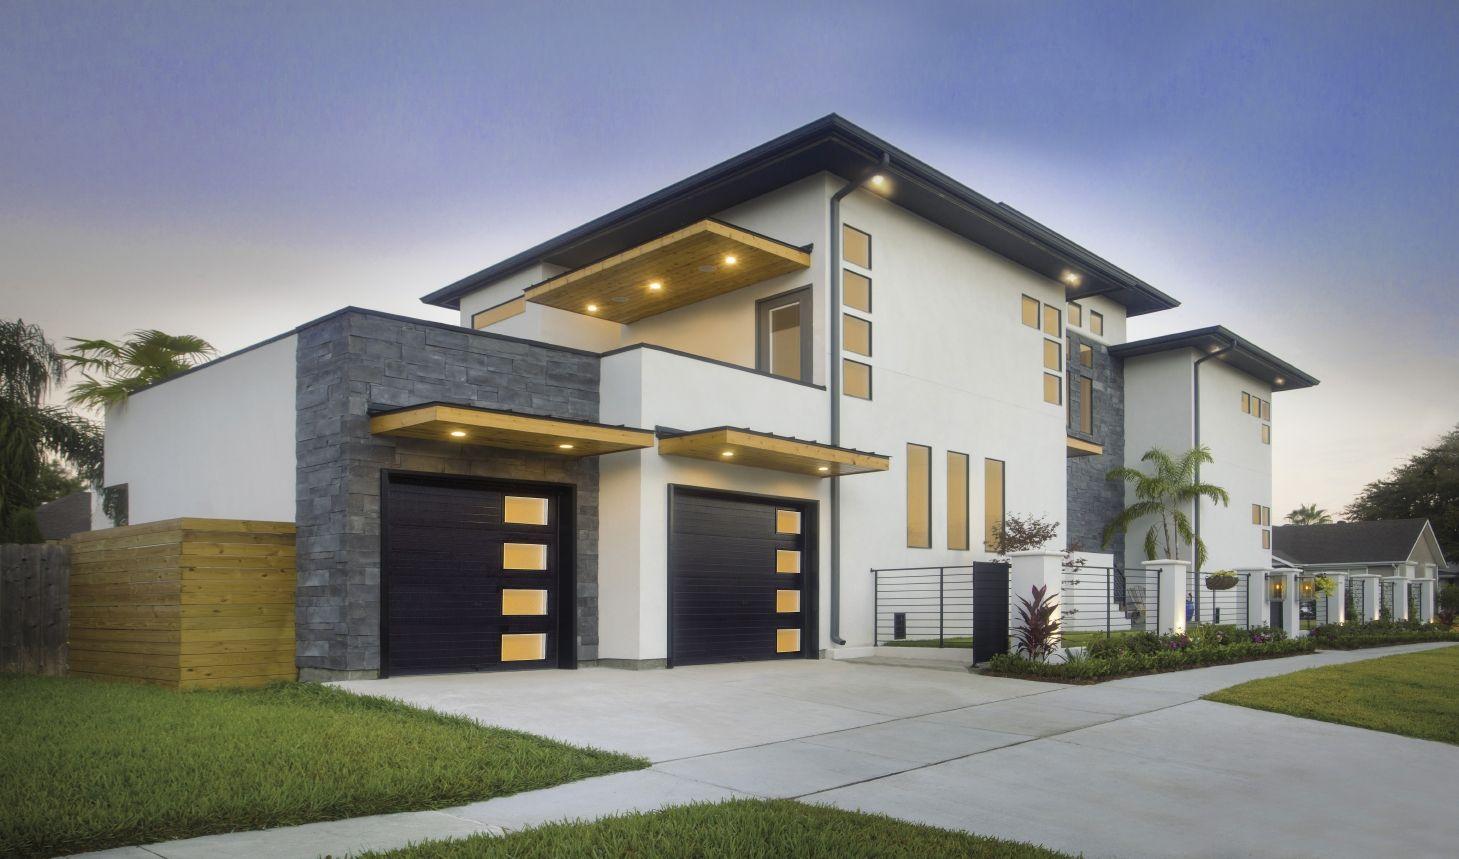 Pin On Modern Garage Doors By Clopay